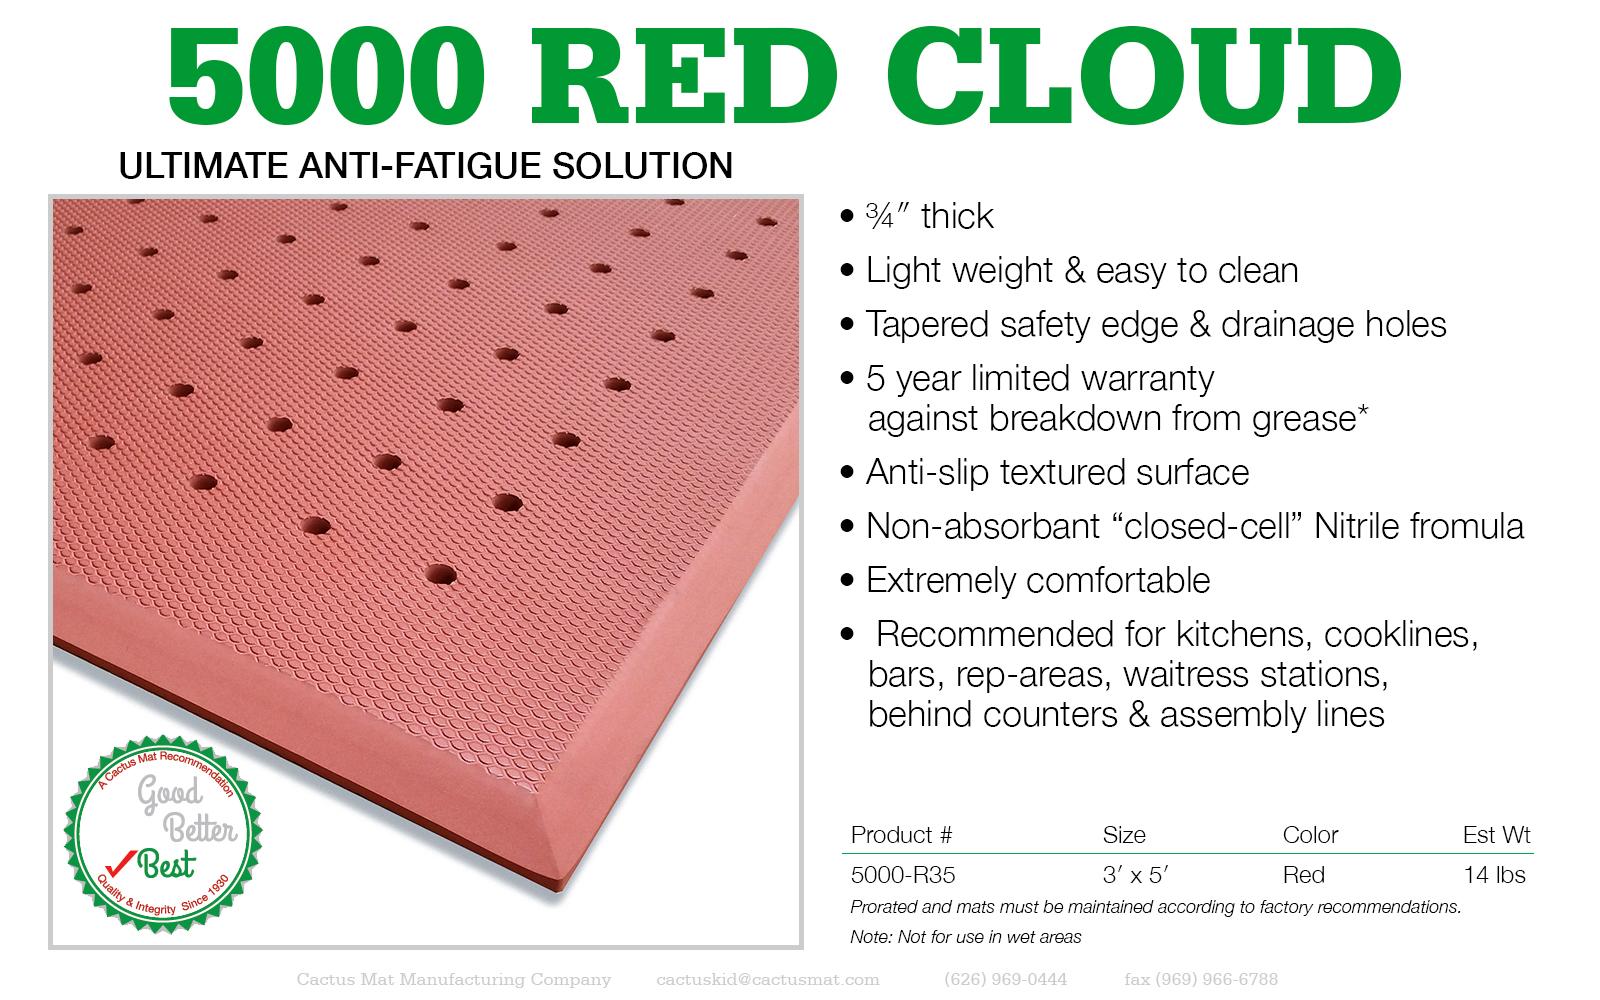 5000_RedCloud_1600x1000.jpg